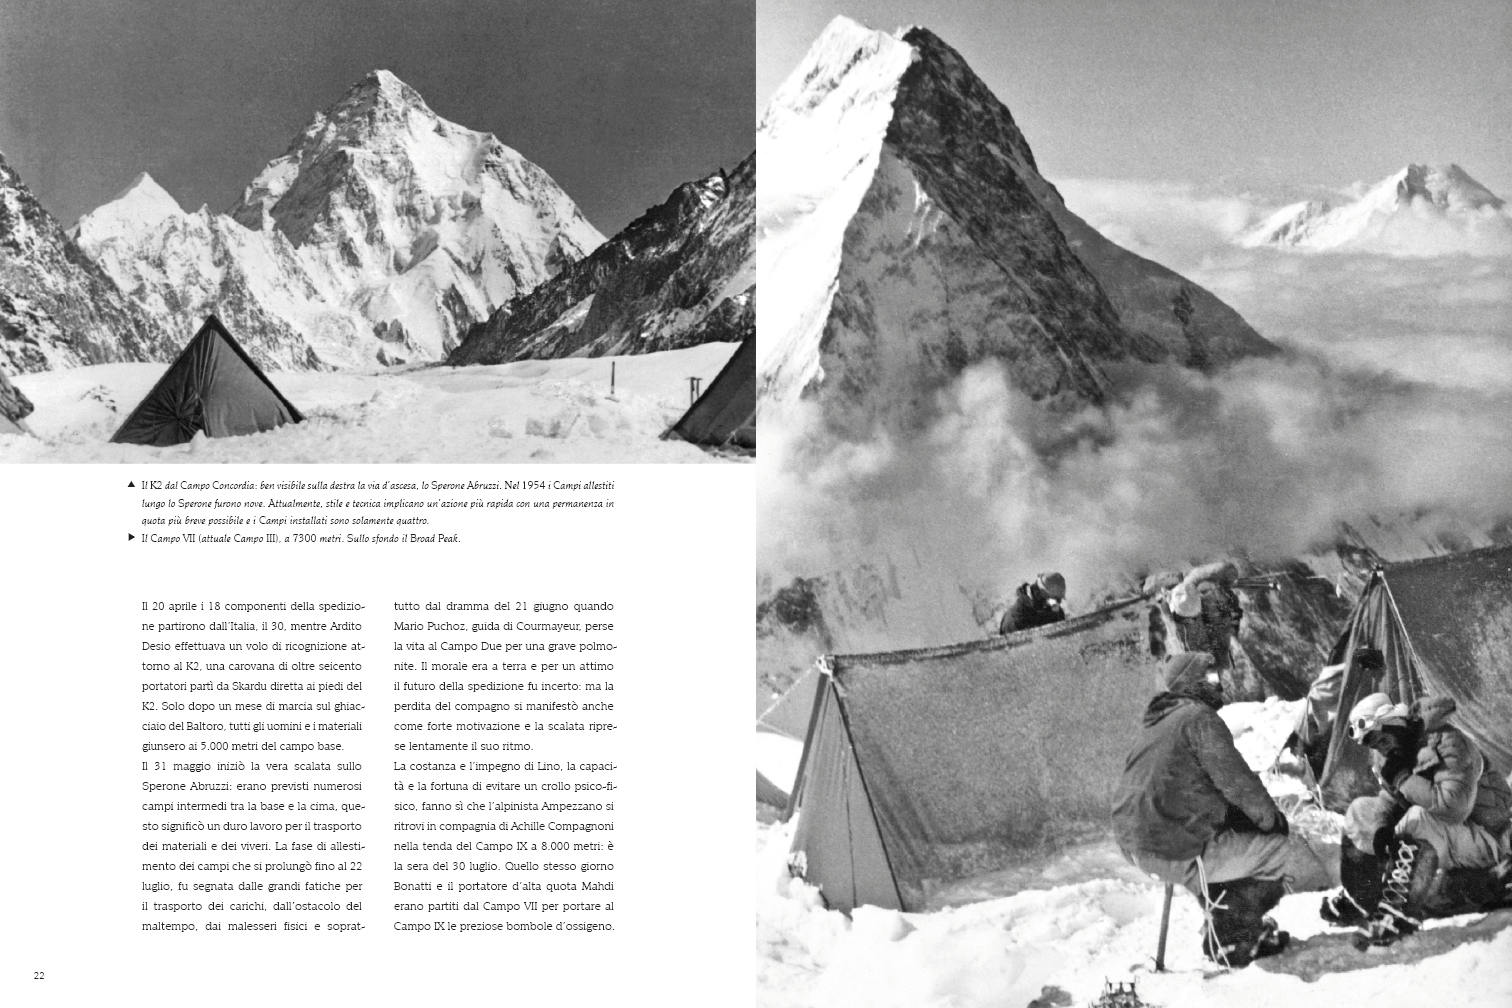 K2 EXPEDITION 1954-2004 Giuseppe Ghedina Fotografo - 013.jpg